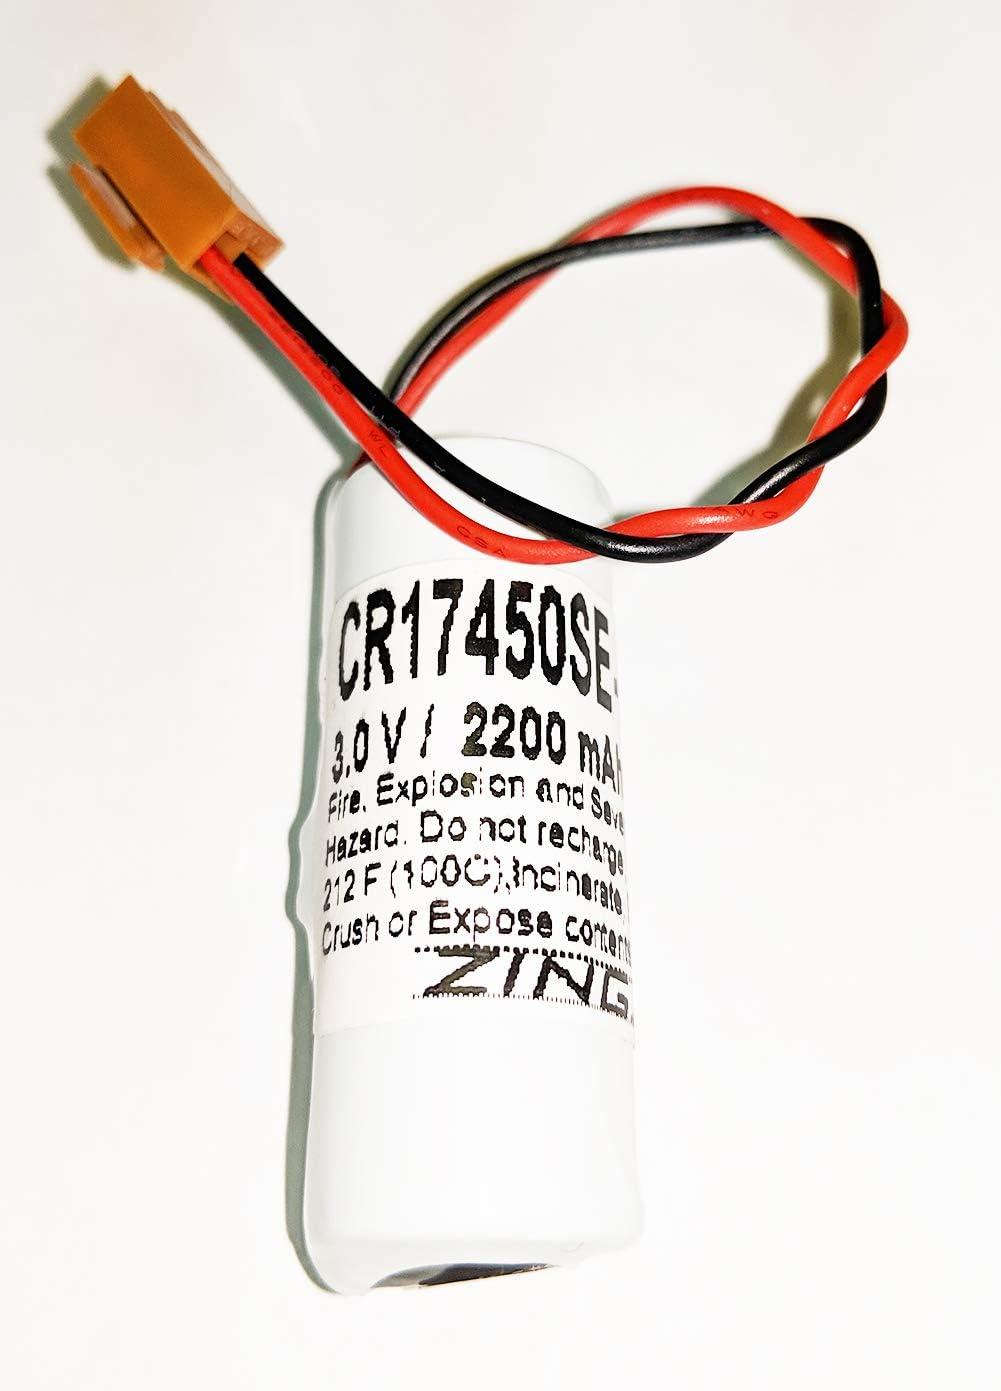 A02B-0200-K102 A02B-0327-B802 CR17450E-RL 3v Sanyo Battery for A98L-0031-0012